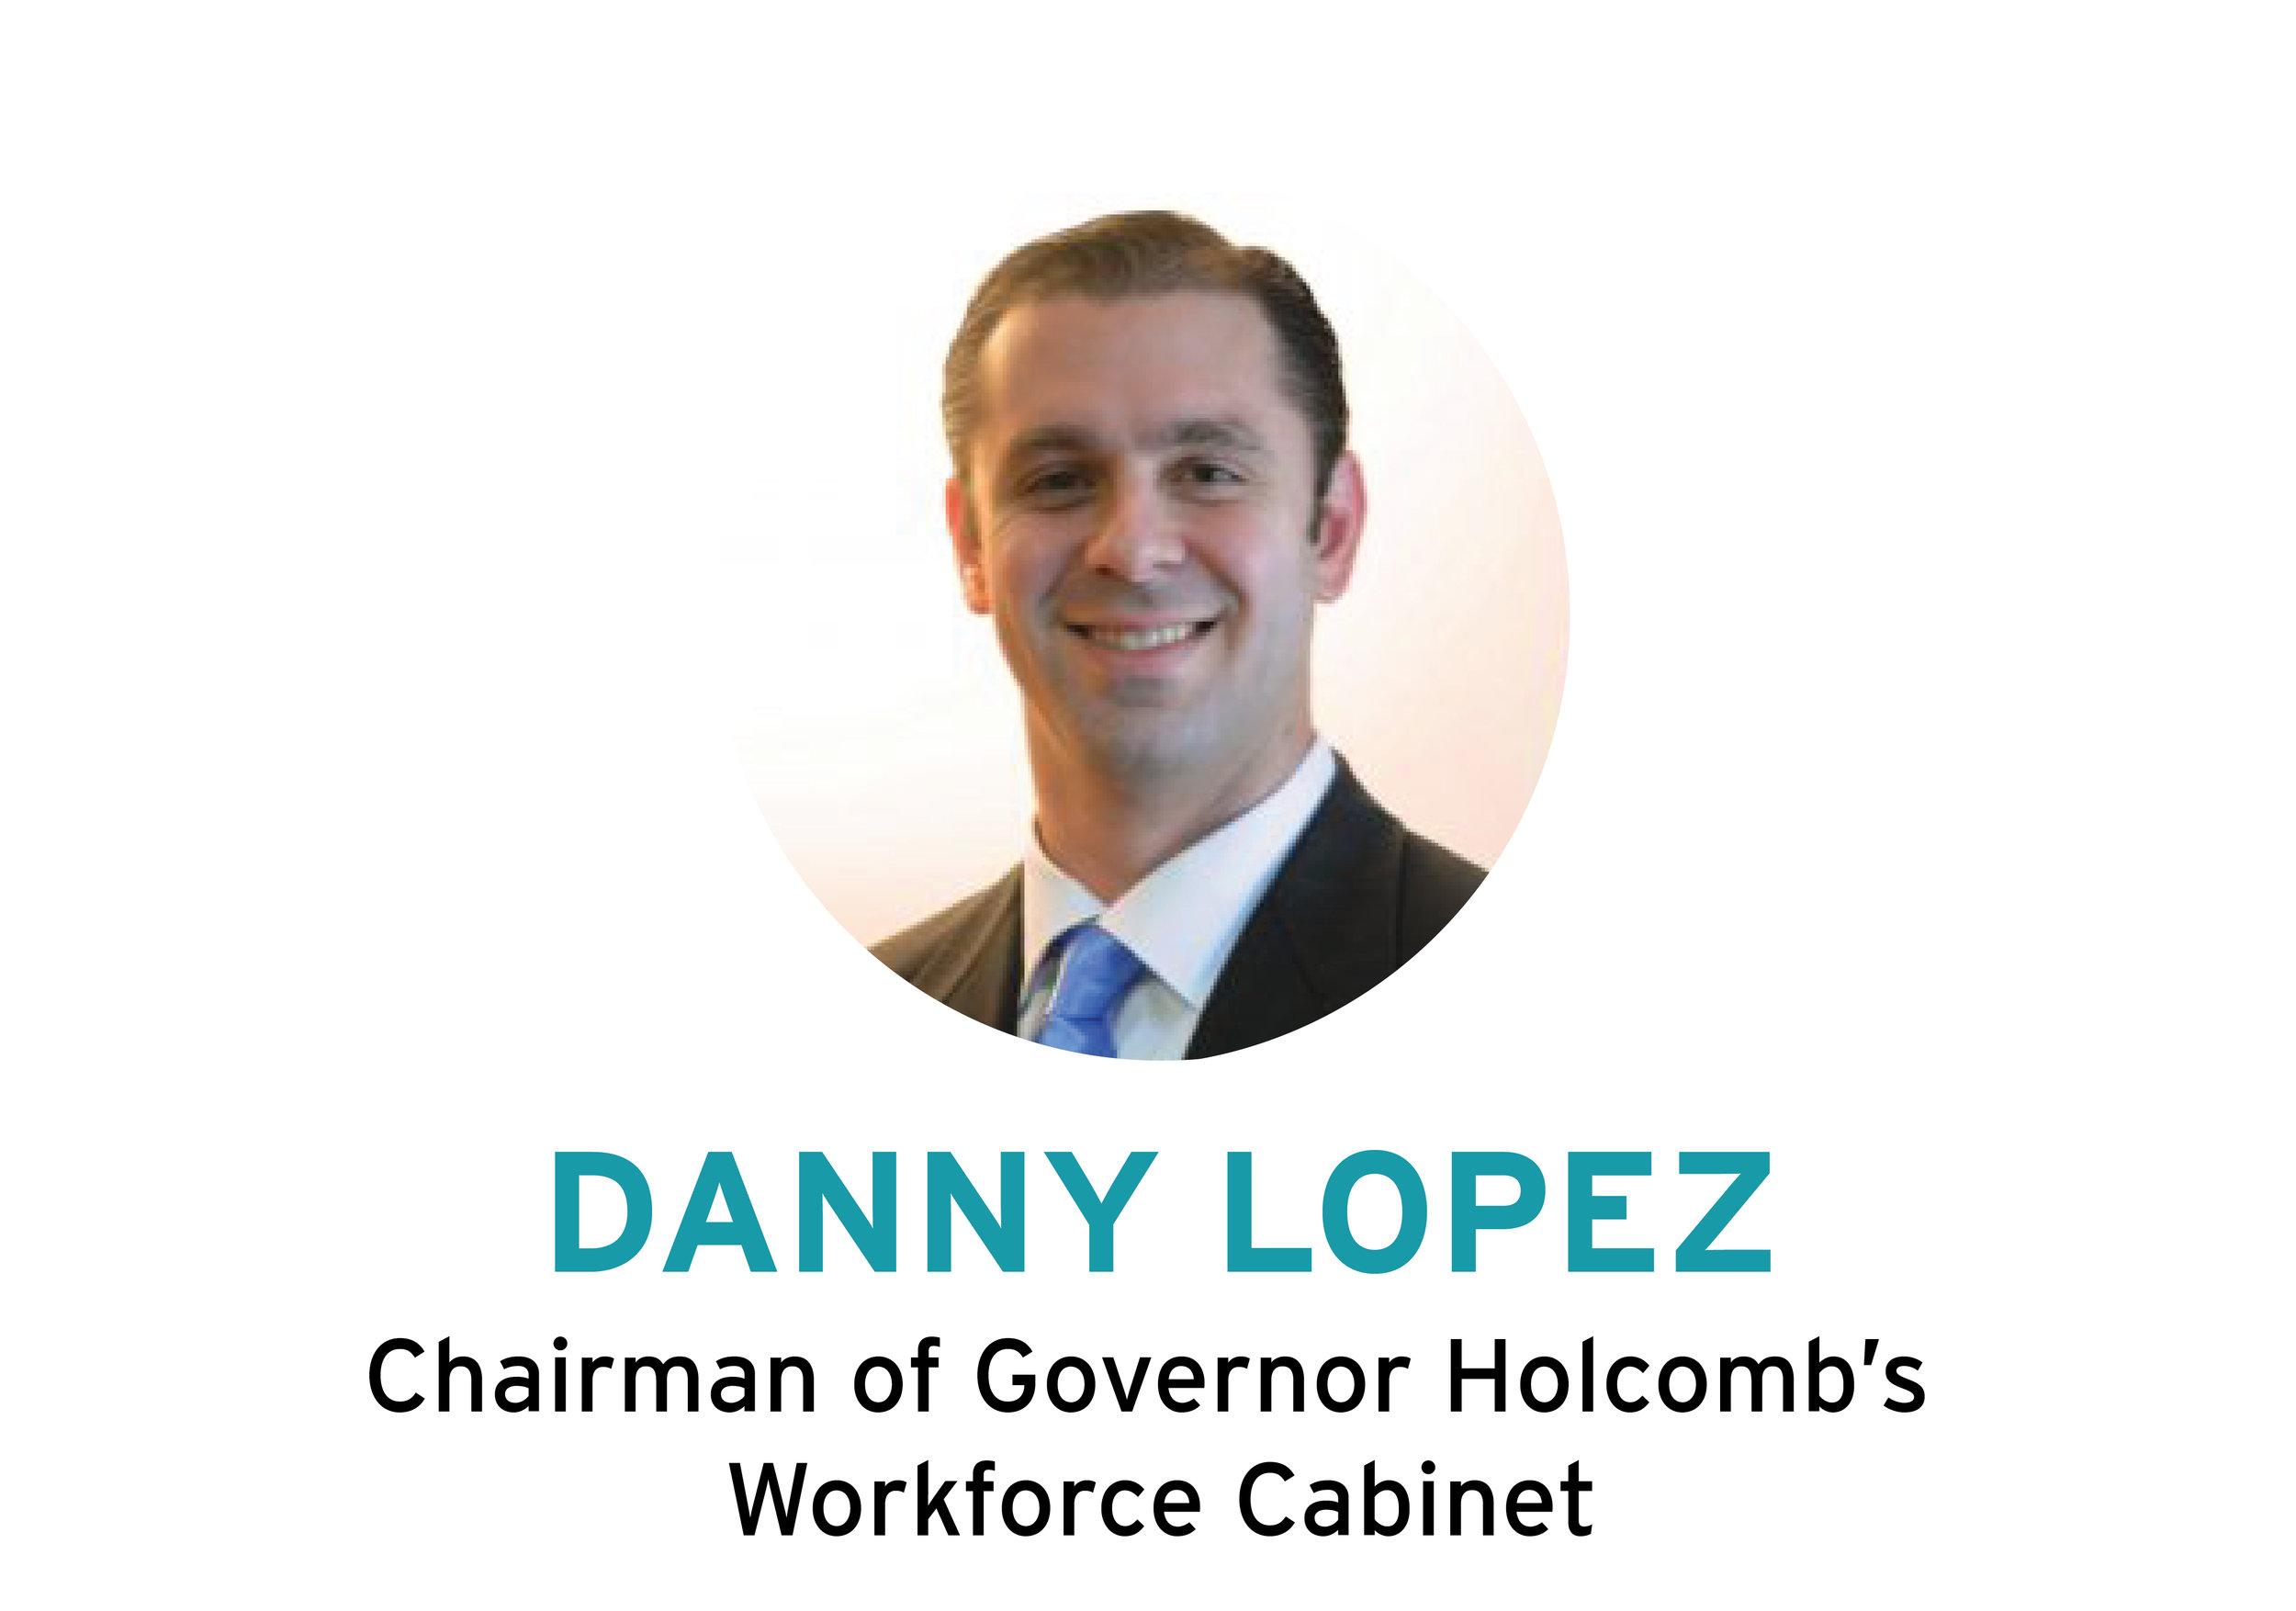 danny-lopez-12.jpg